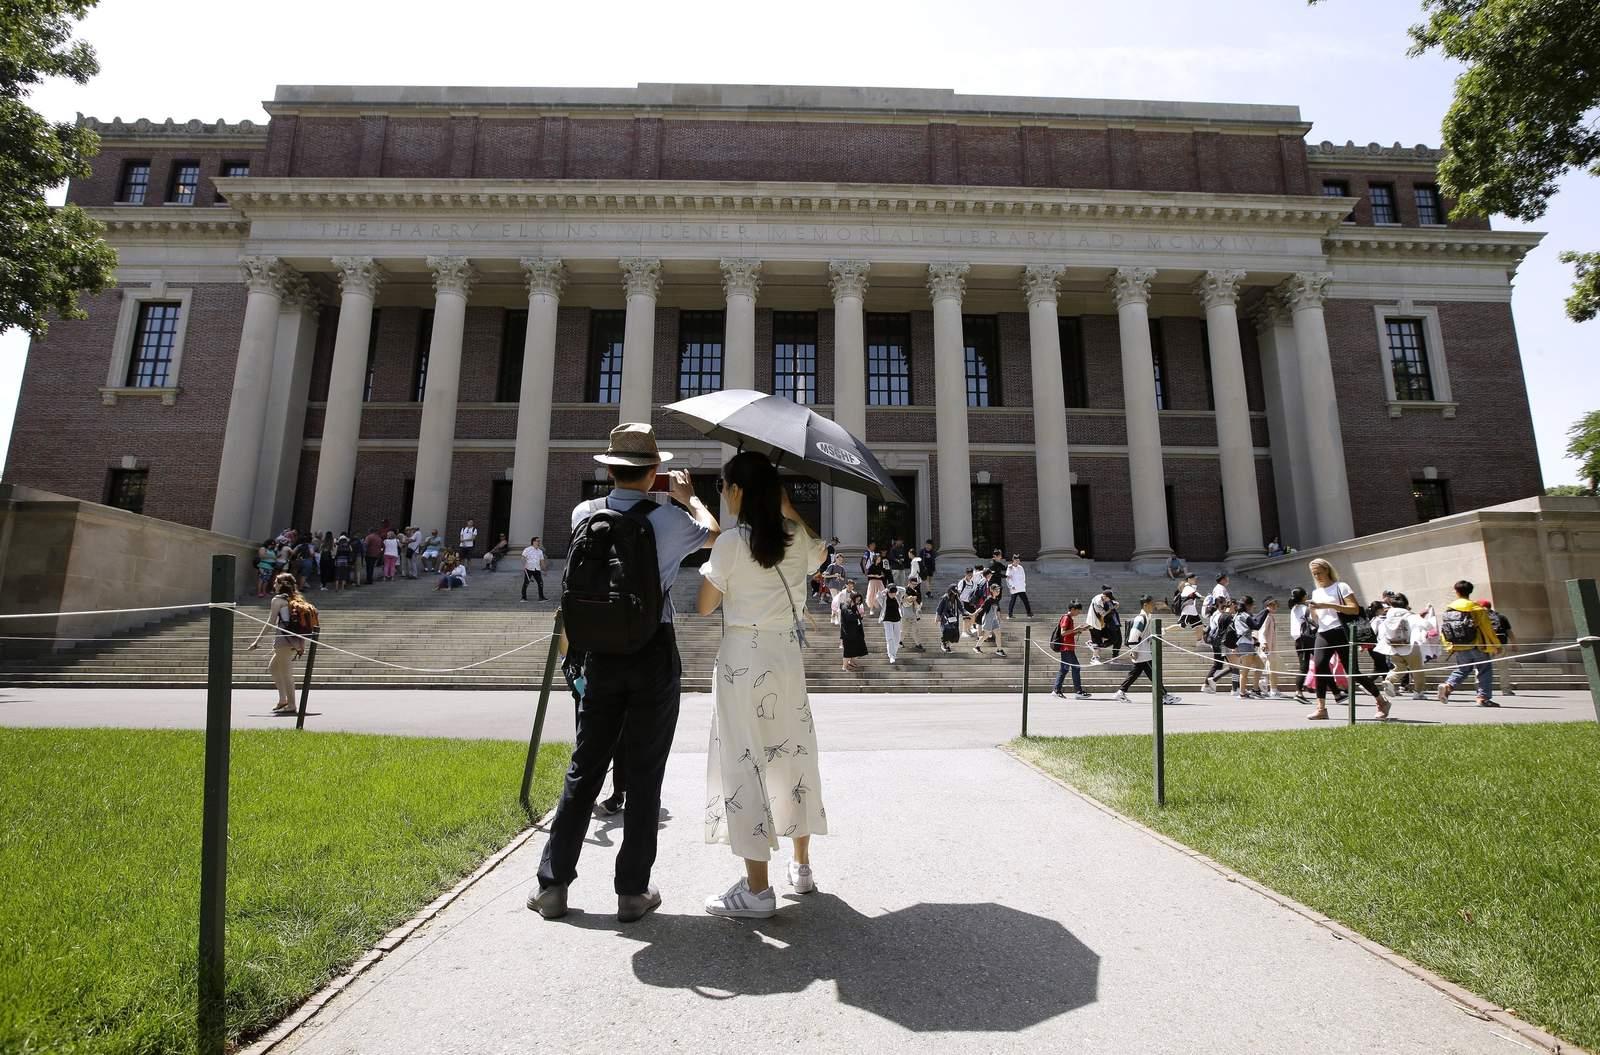 www.click2houston.com: Judges scrutinize suit's claims in Harvard racial bias case